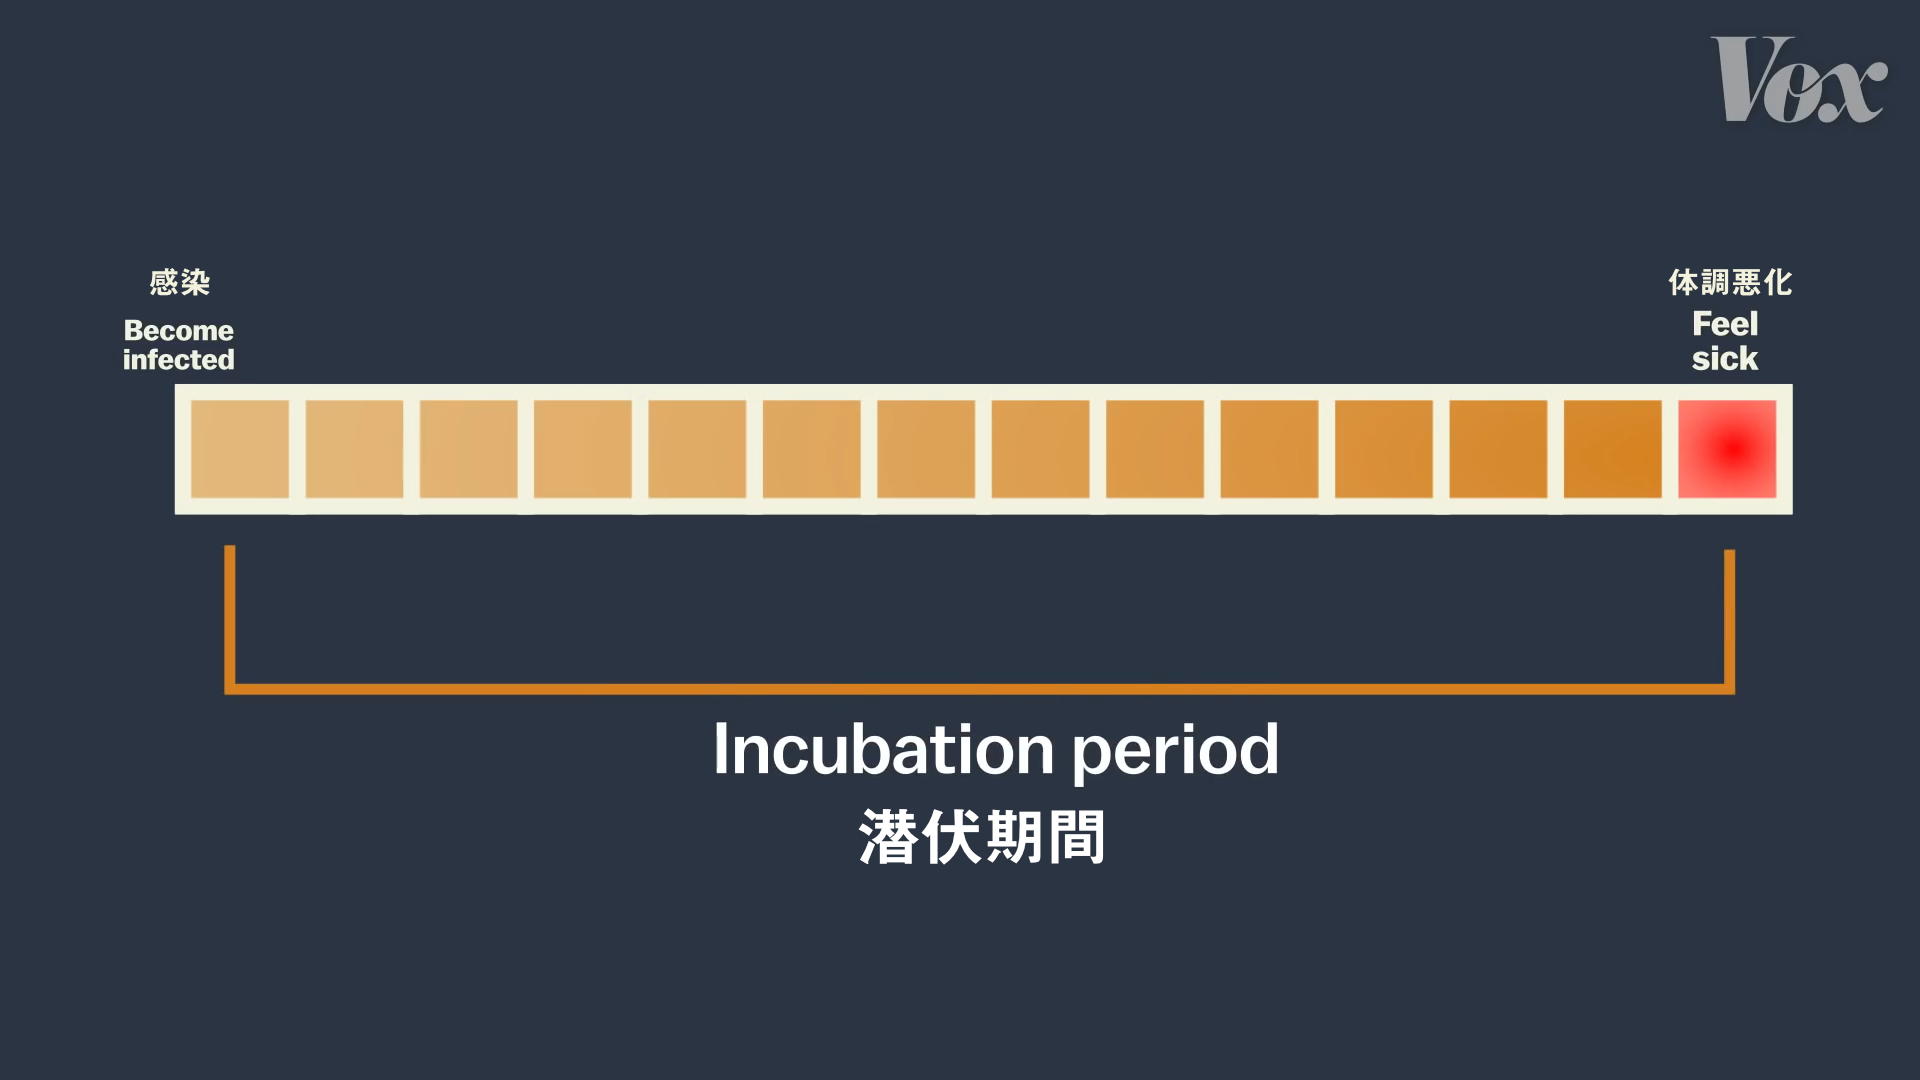 f:id:Imamura:20200408133308p:plain